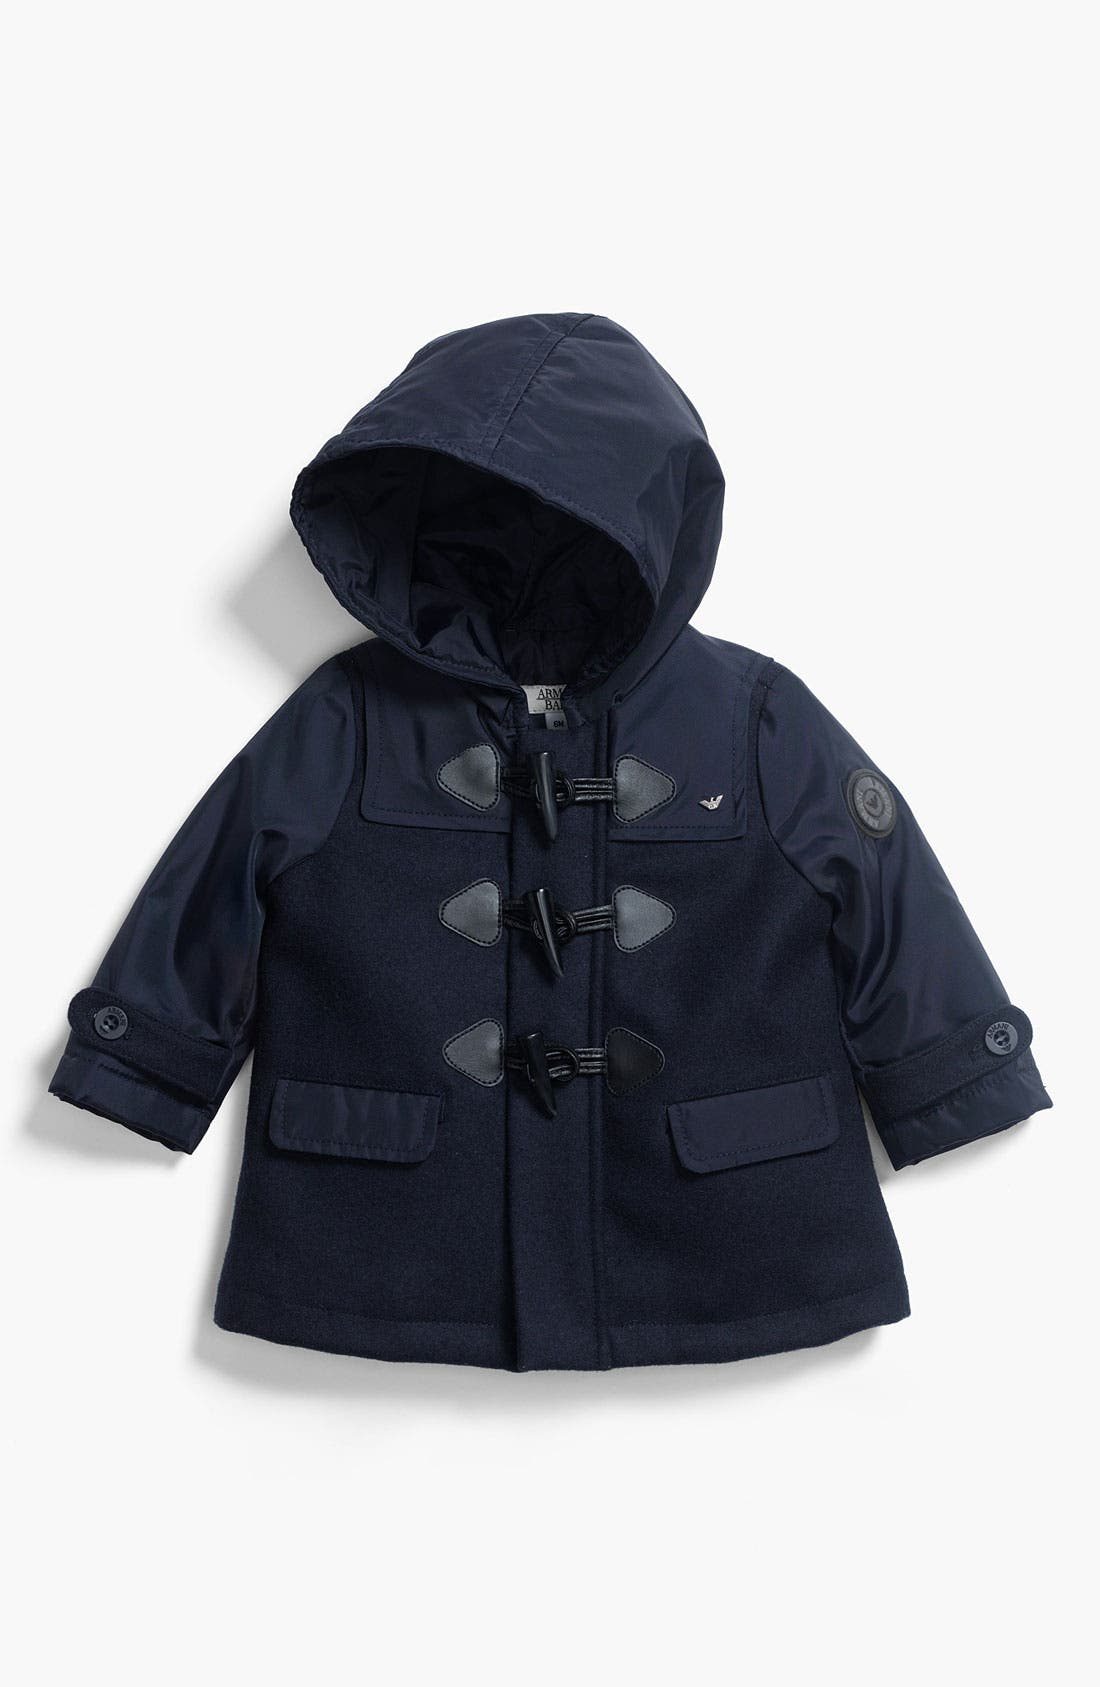 Main Image - Armani Junior Toggle Coat (Infant)